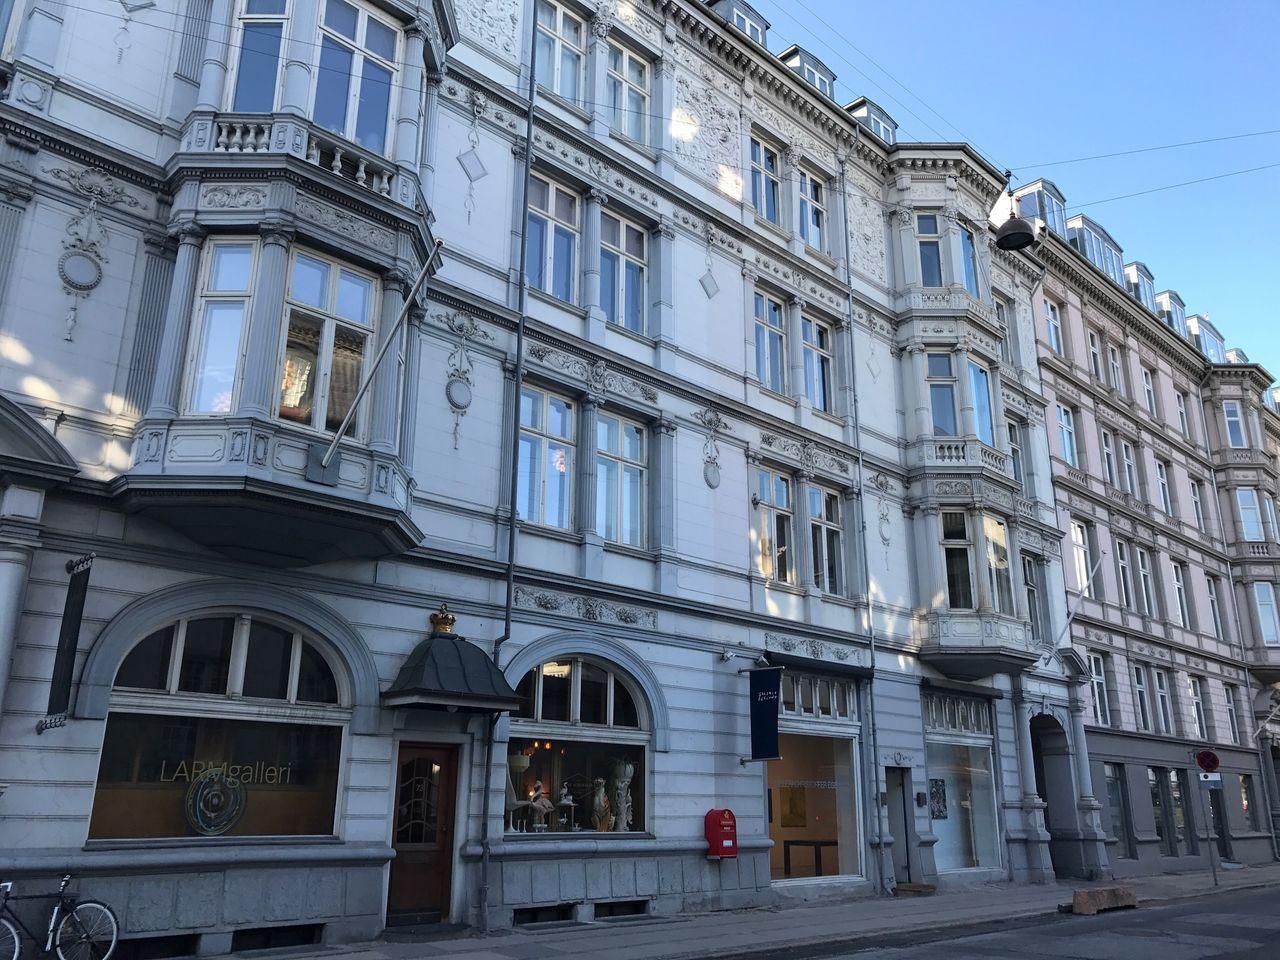 Building Exterior Architecture No People City European  History City Danmark Copenhagen